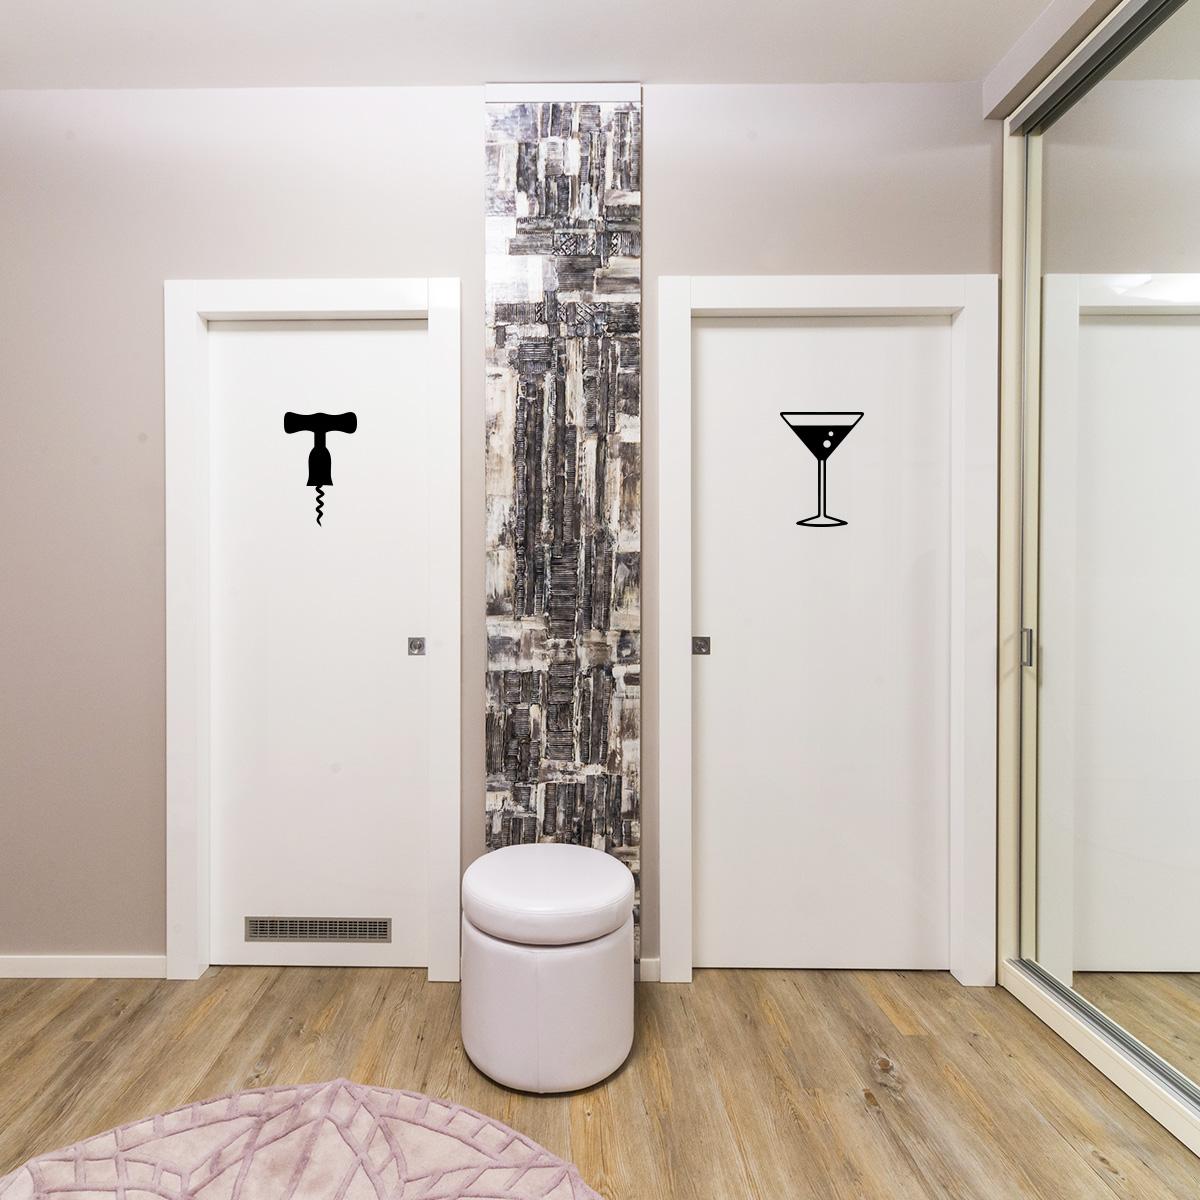 sticker porte de toilette homme femme festif stickers. Black Bedroom Furniture Sets. Home Design Ideas